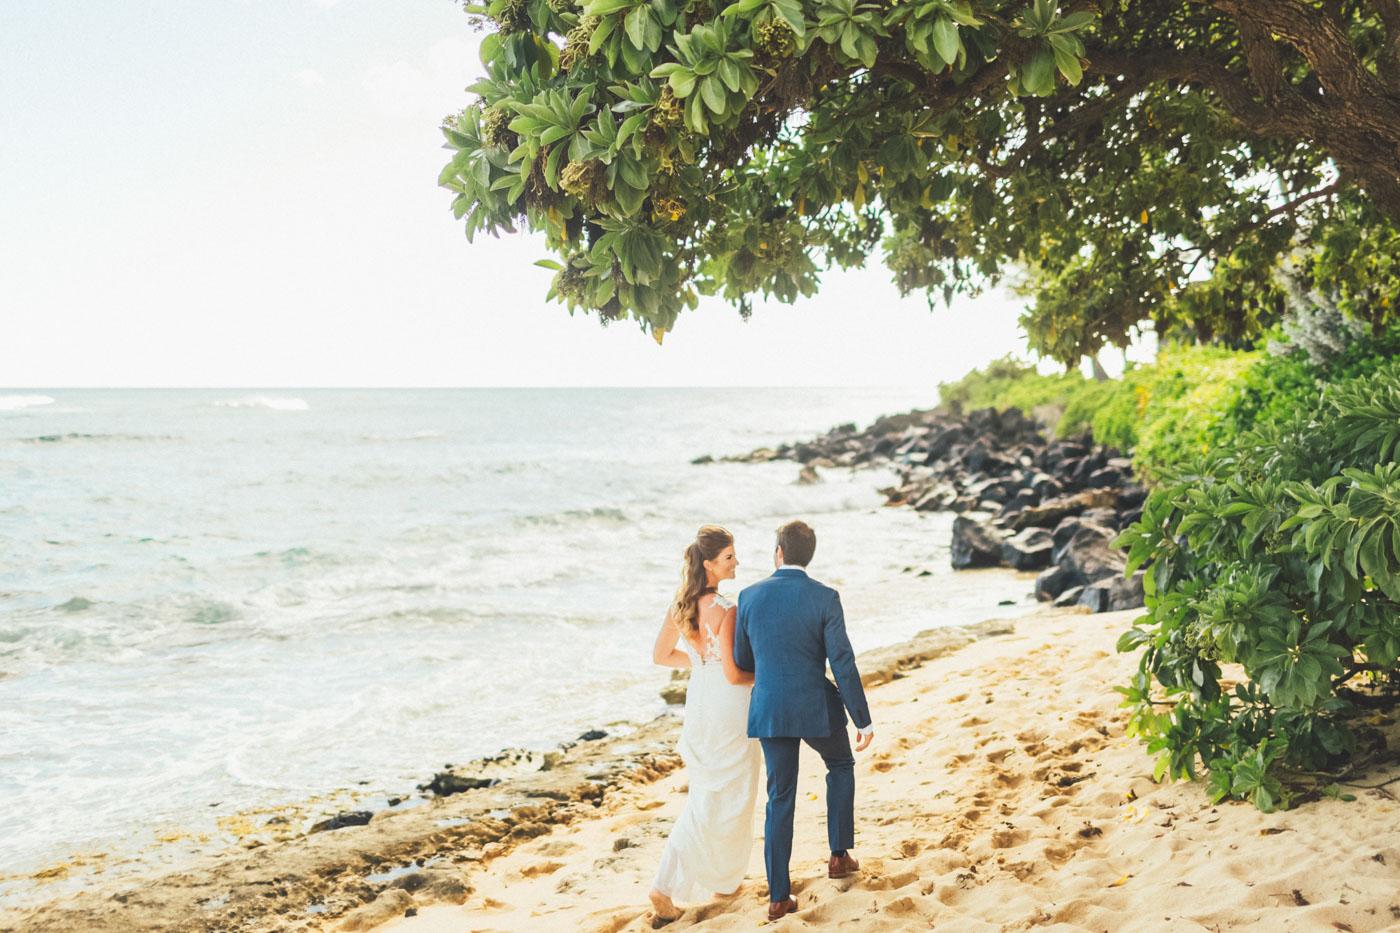 maui wedding photographer_45.jpg